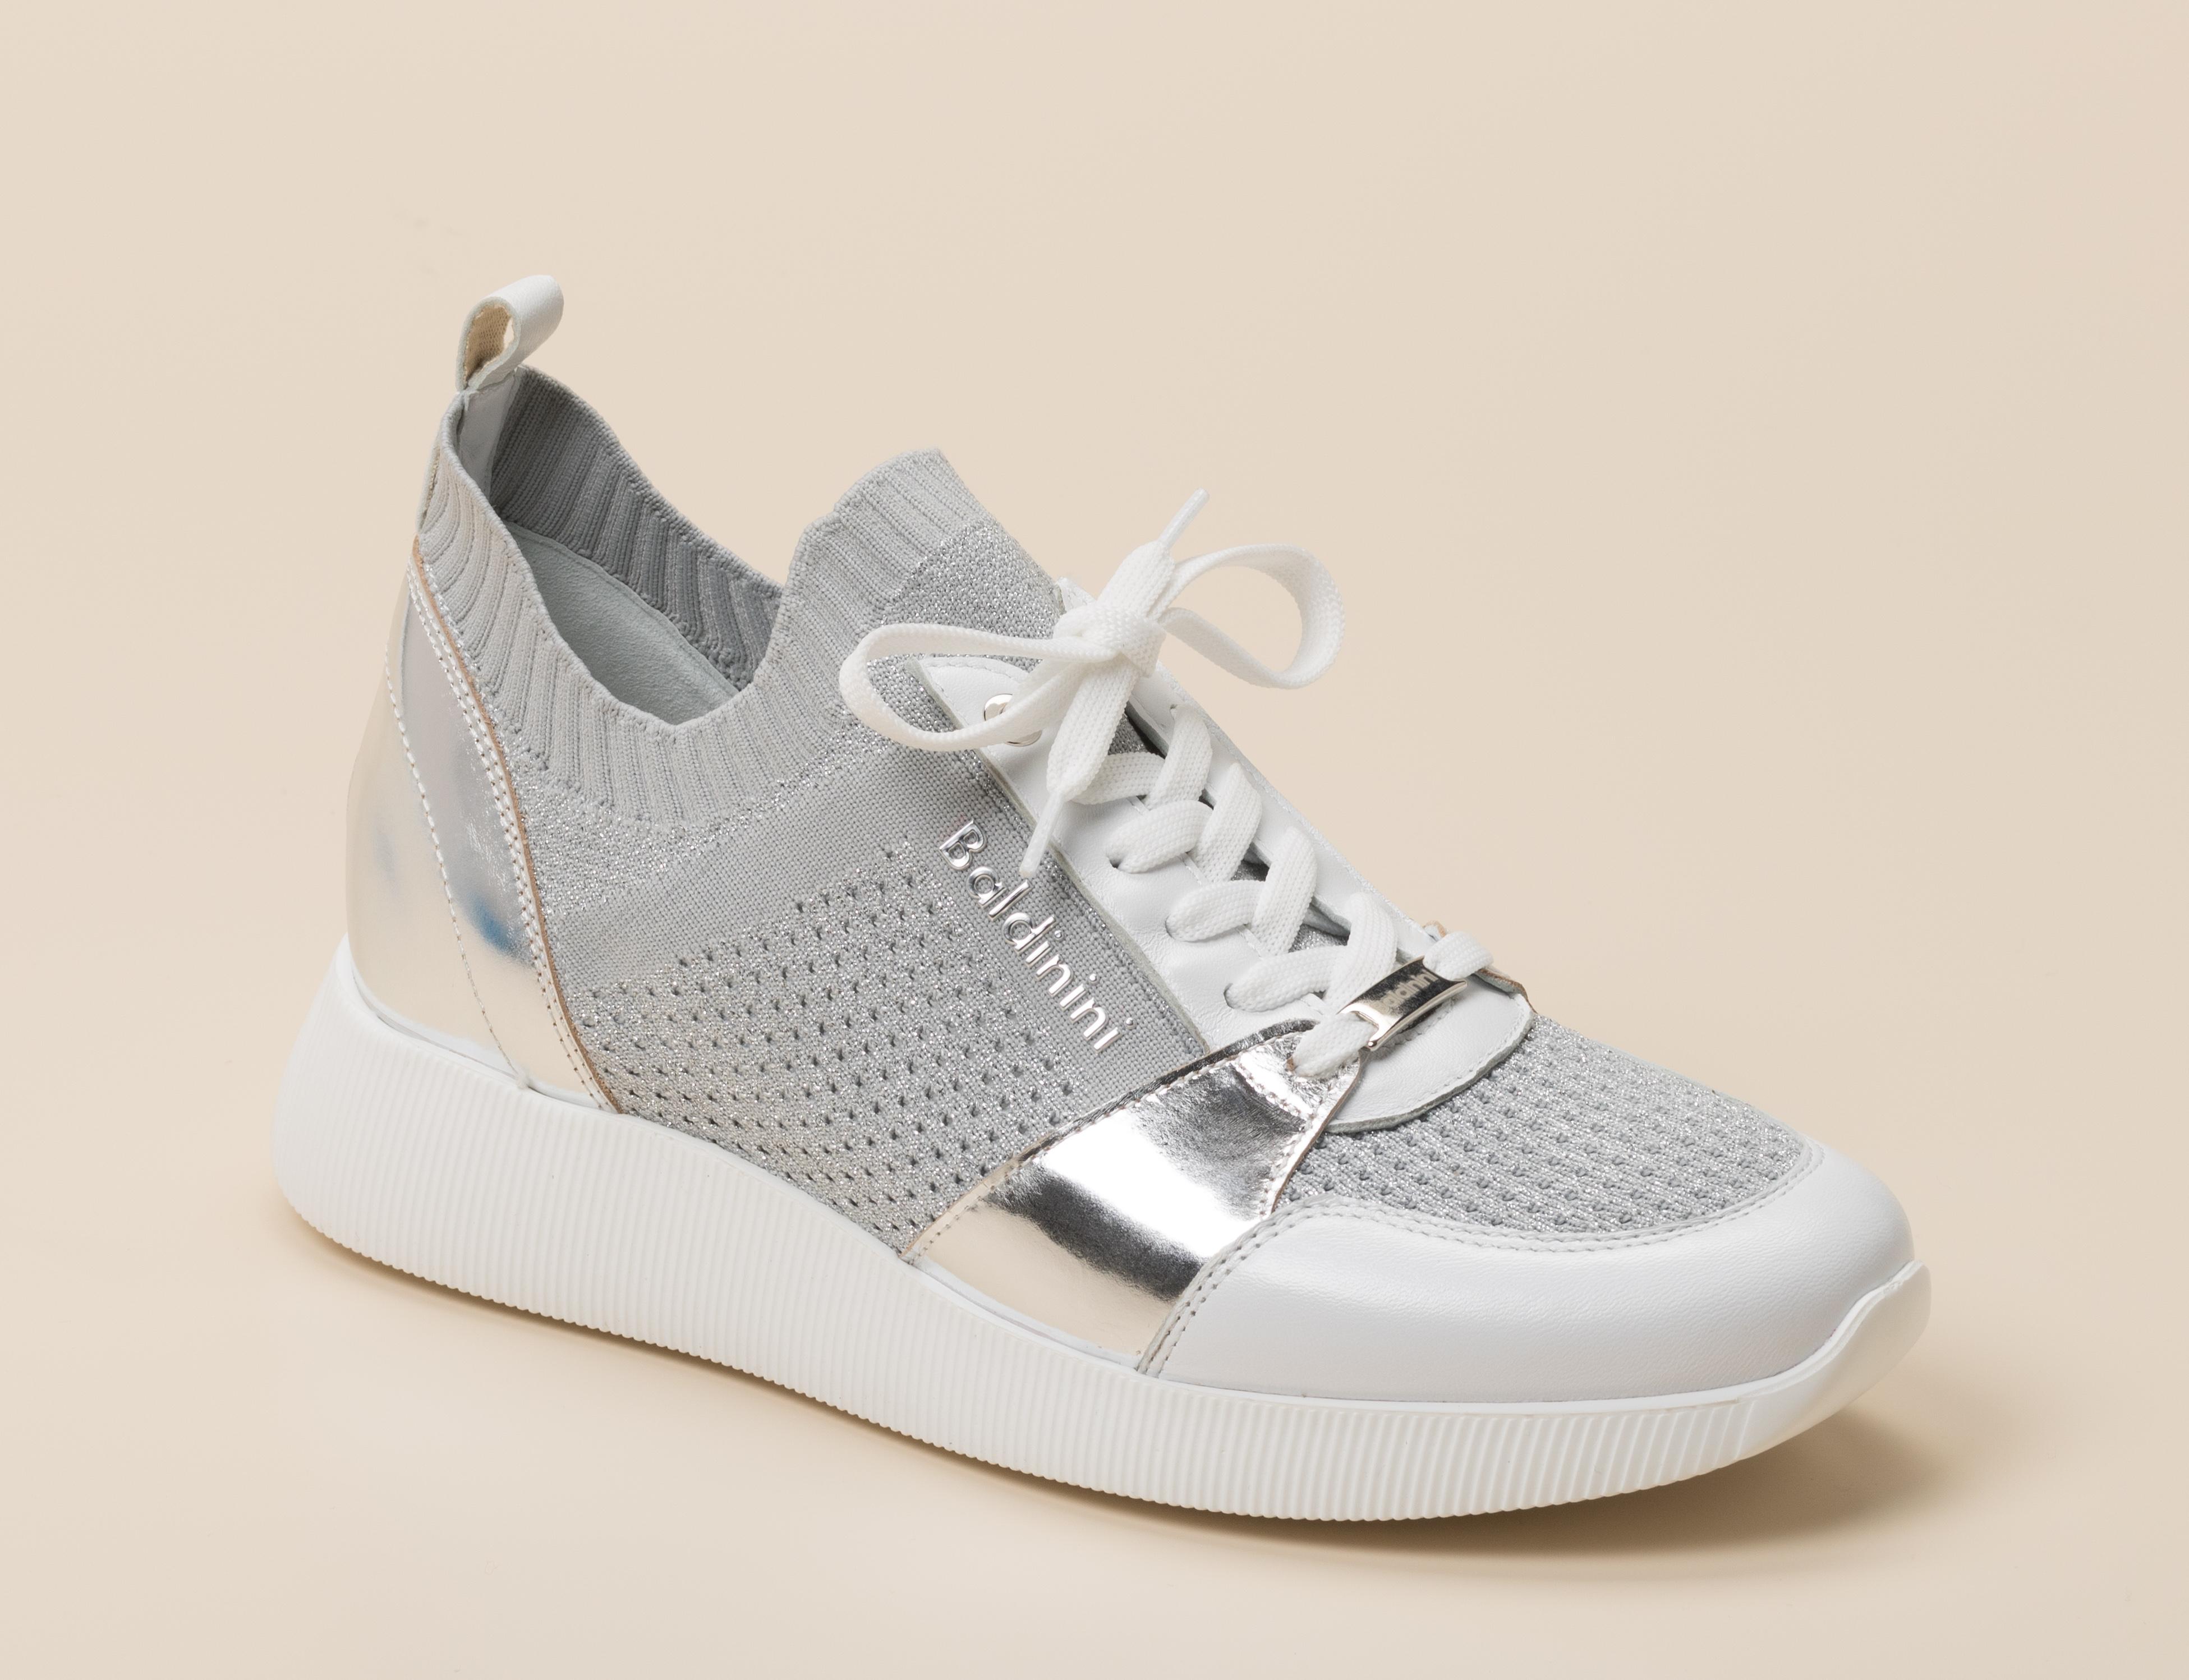 Sneaker KaufenZumnorde Online In Damen Baldinini Shop Grau W9EHeY2ID